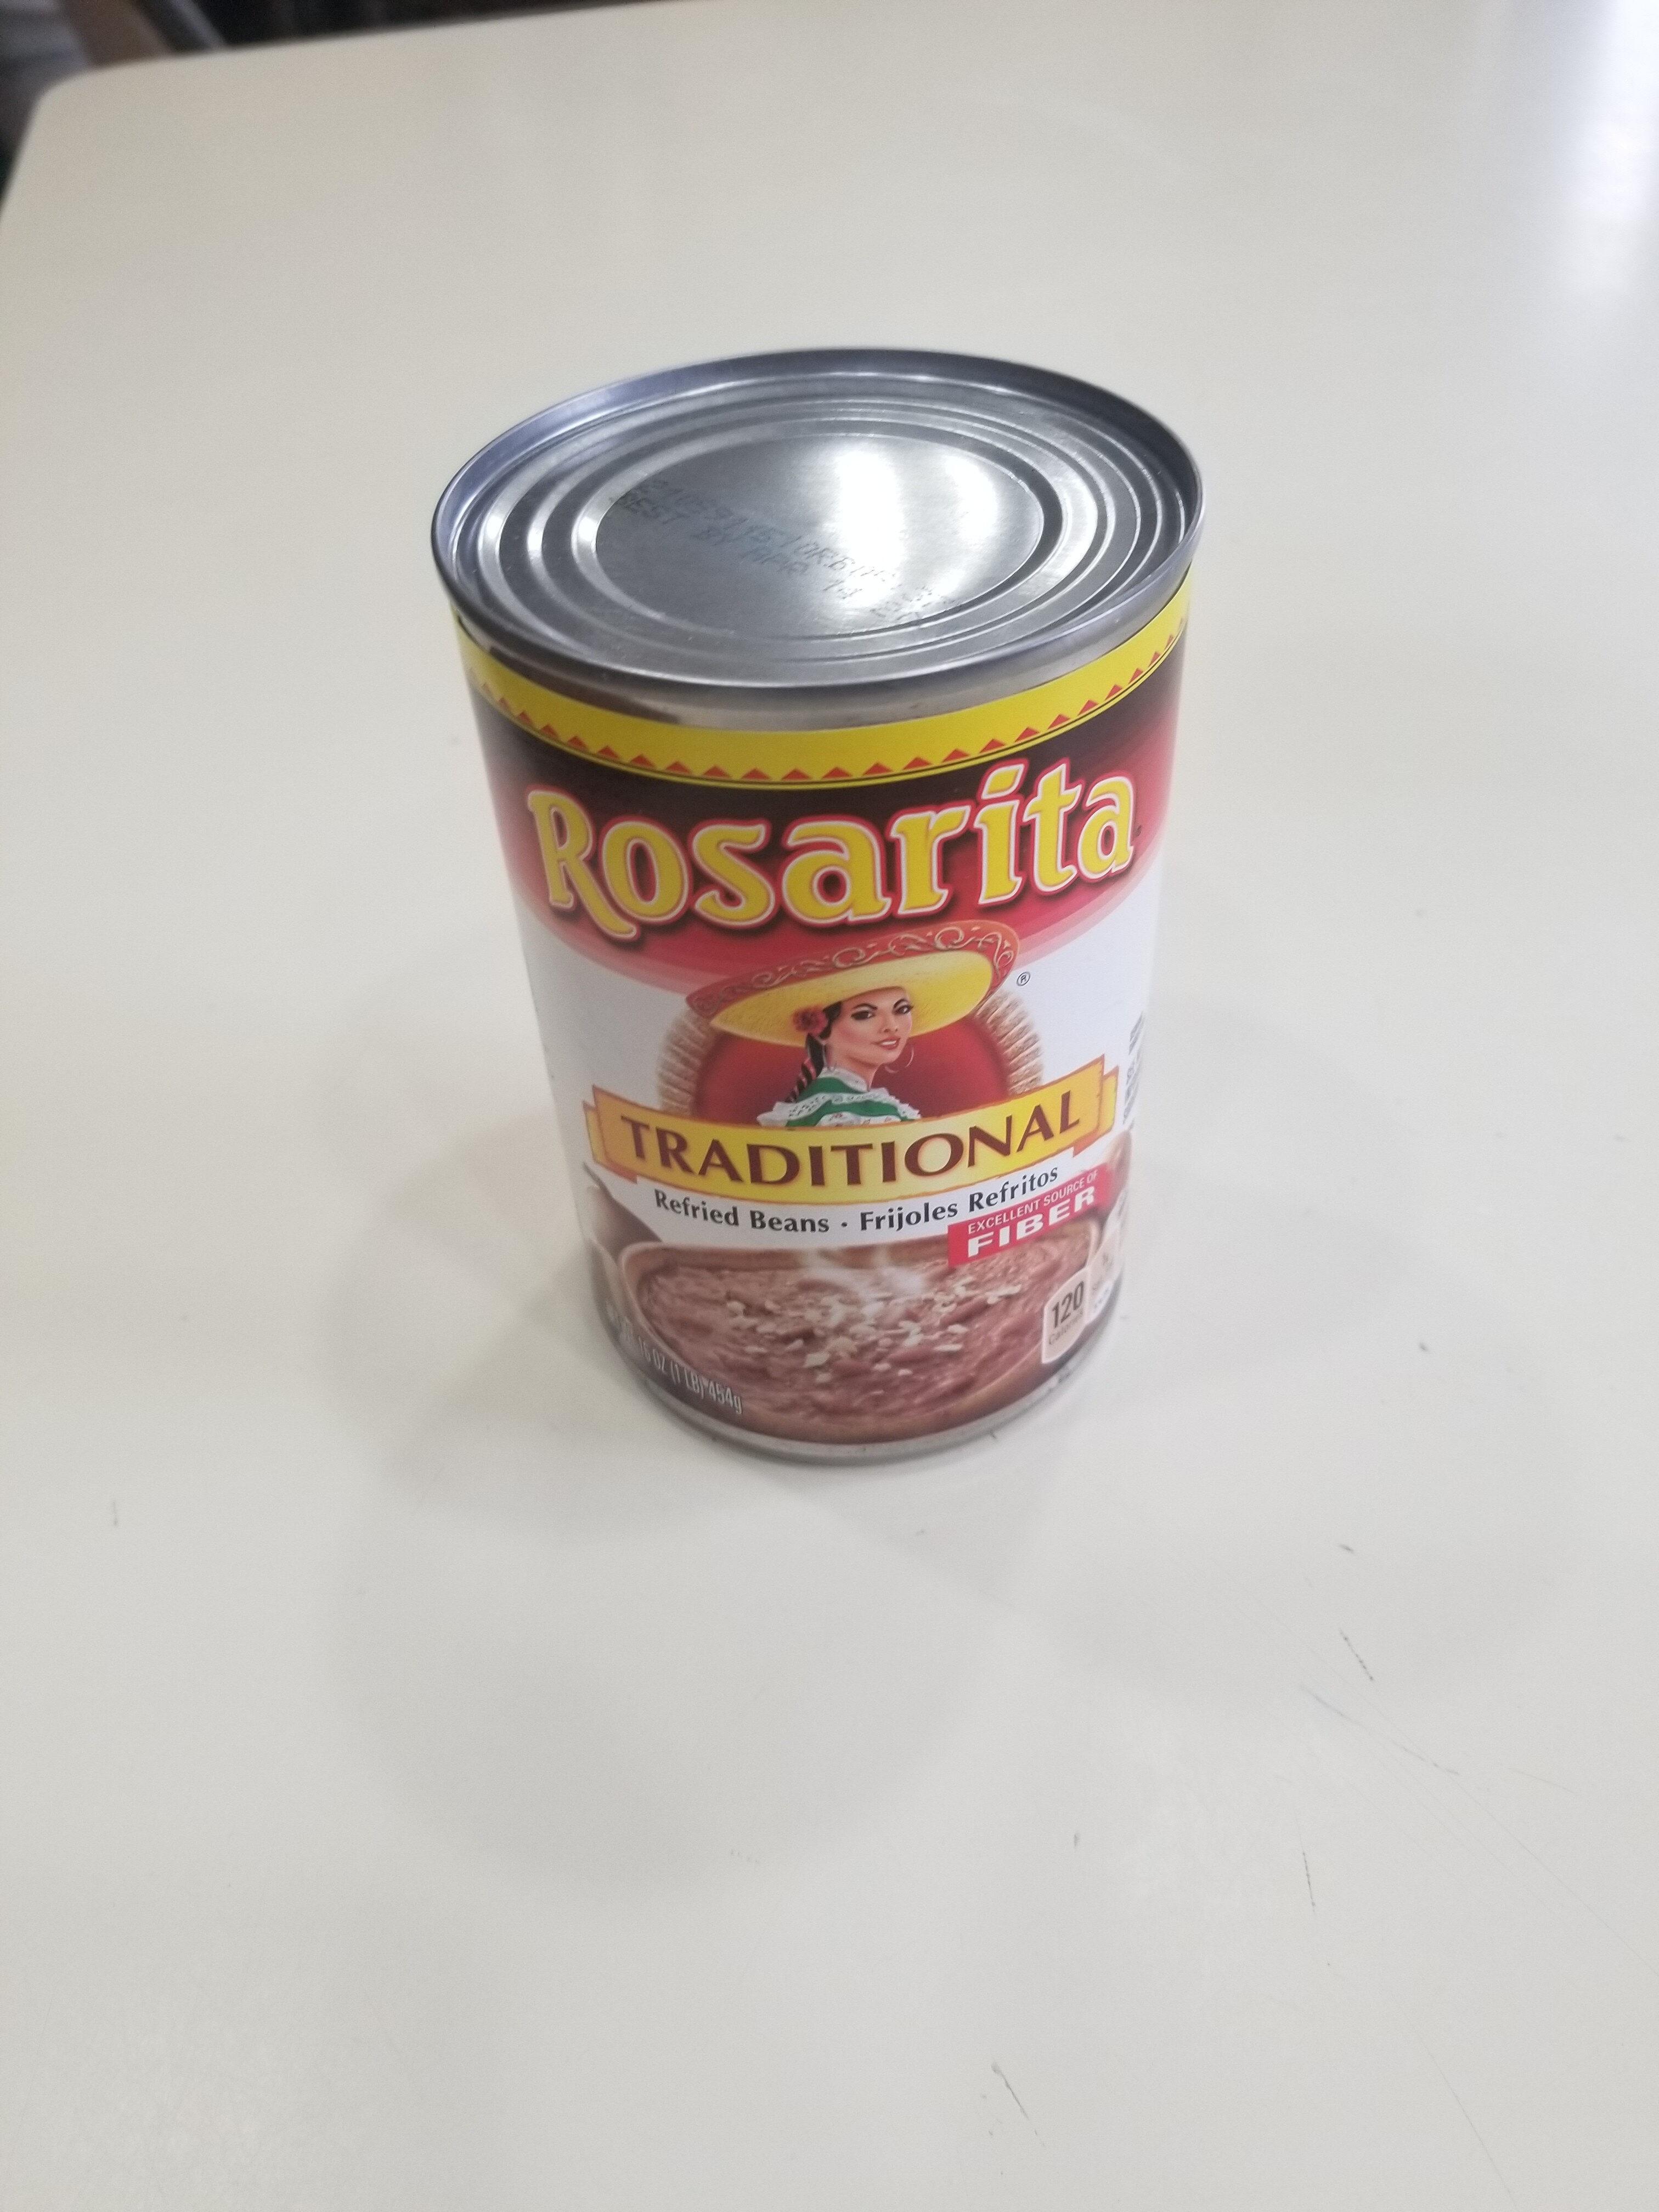 Rosarita Traditional Refried Beans - Product - en